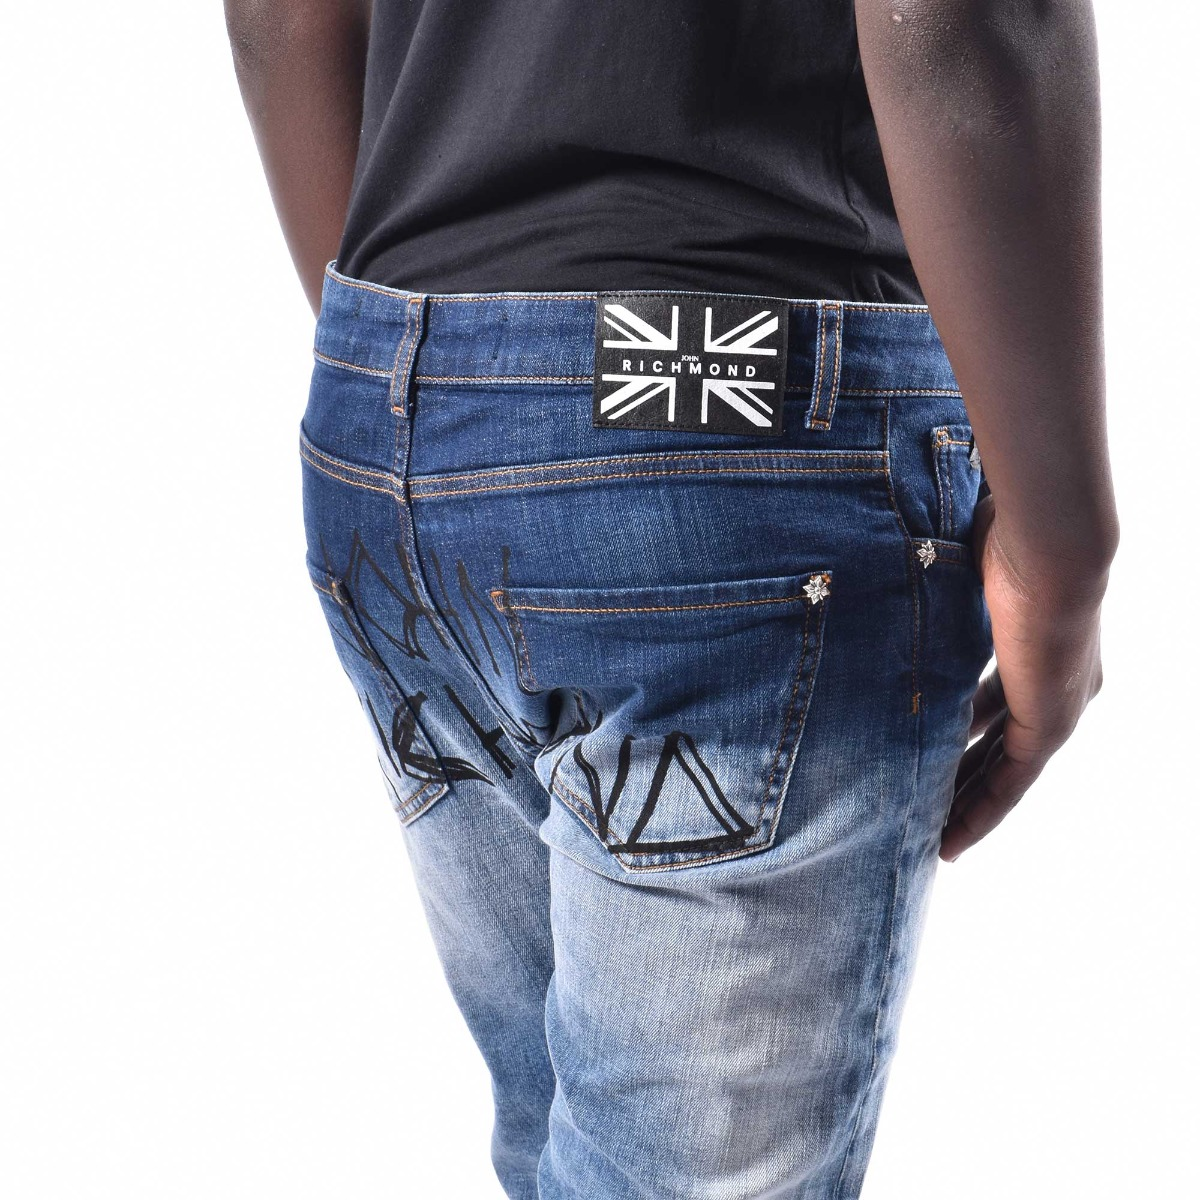 Jeans merry slavato - Denim